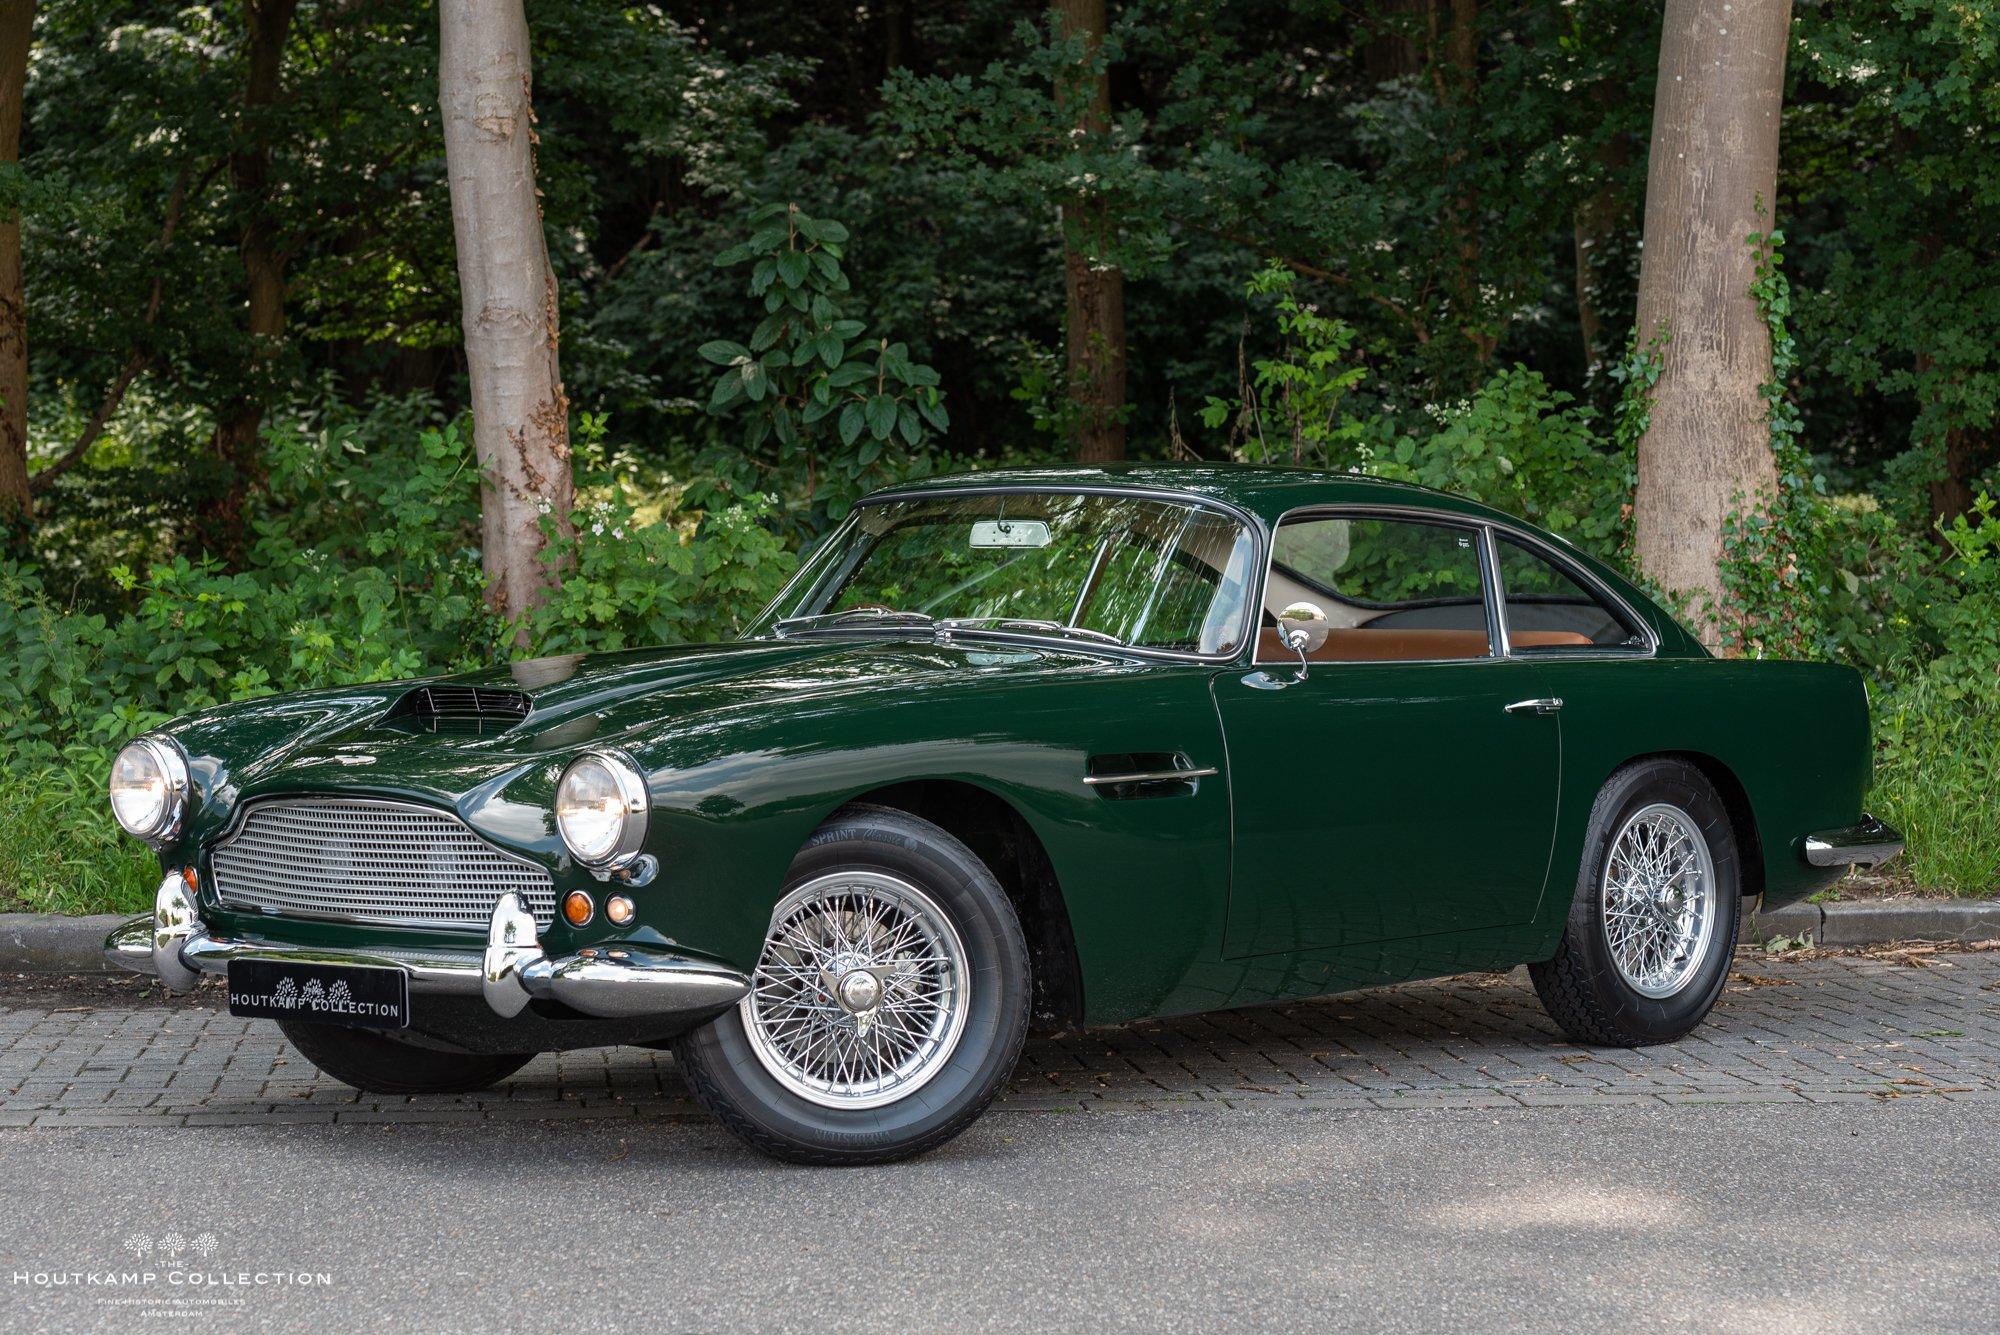 1959 Aston Martin Db4 The 51st Db4 Produced Oldtimer Zu Verkaufen